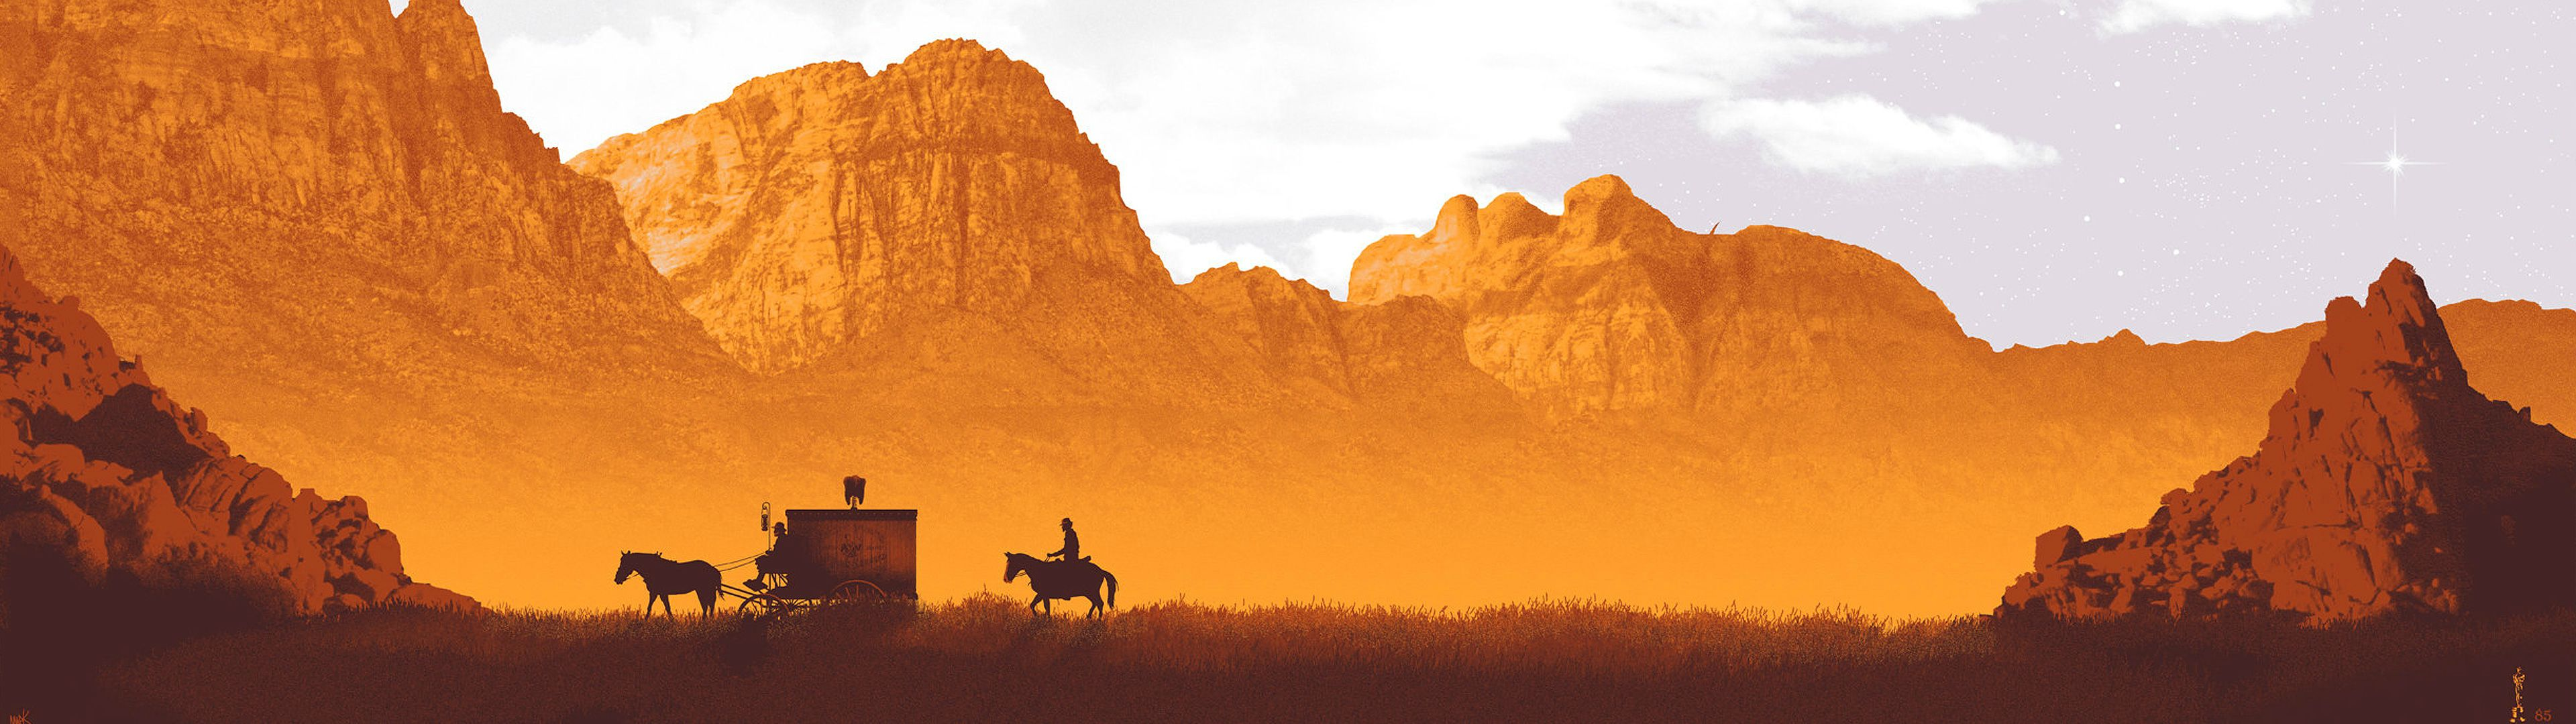 Background image django - Hd Wallpaper Background Id 442420 3840x1080 Movie Django Unchained